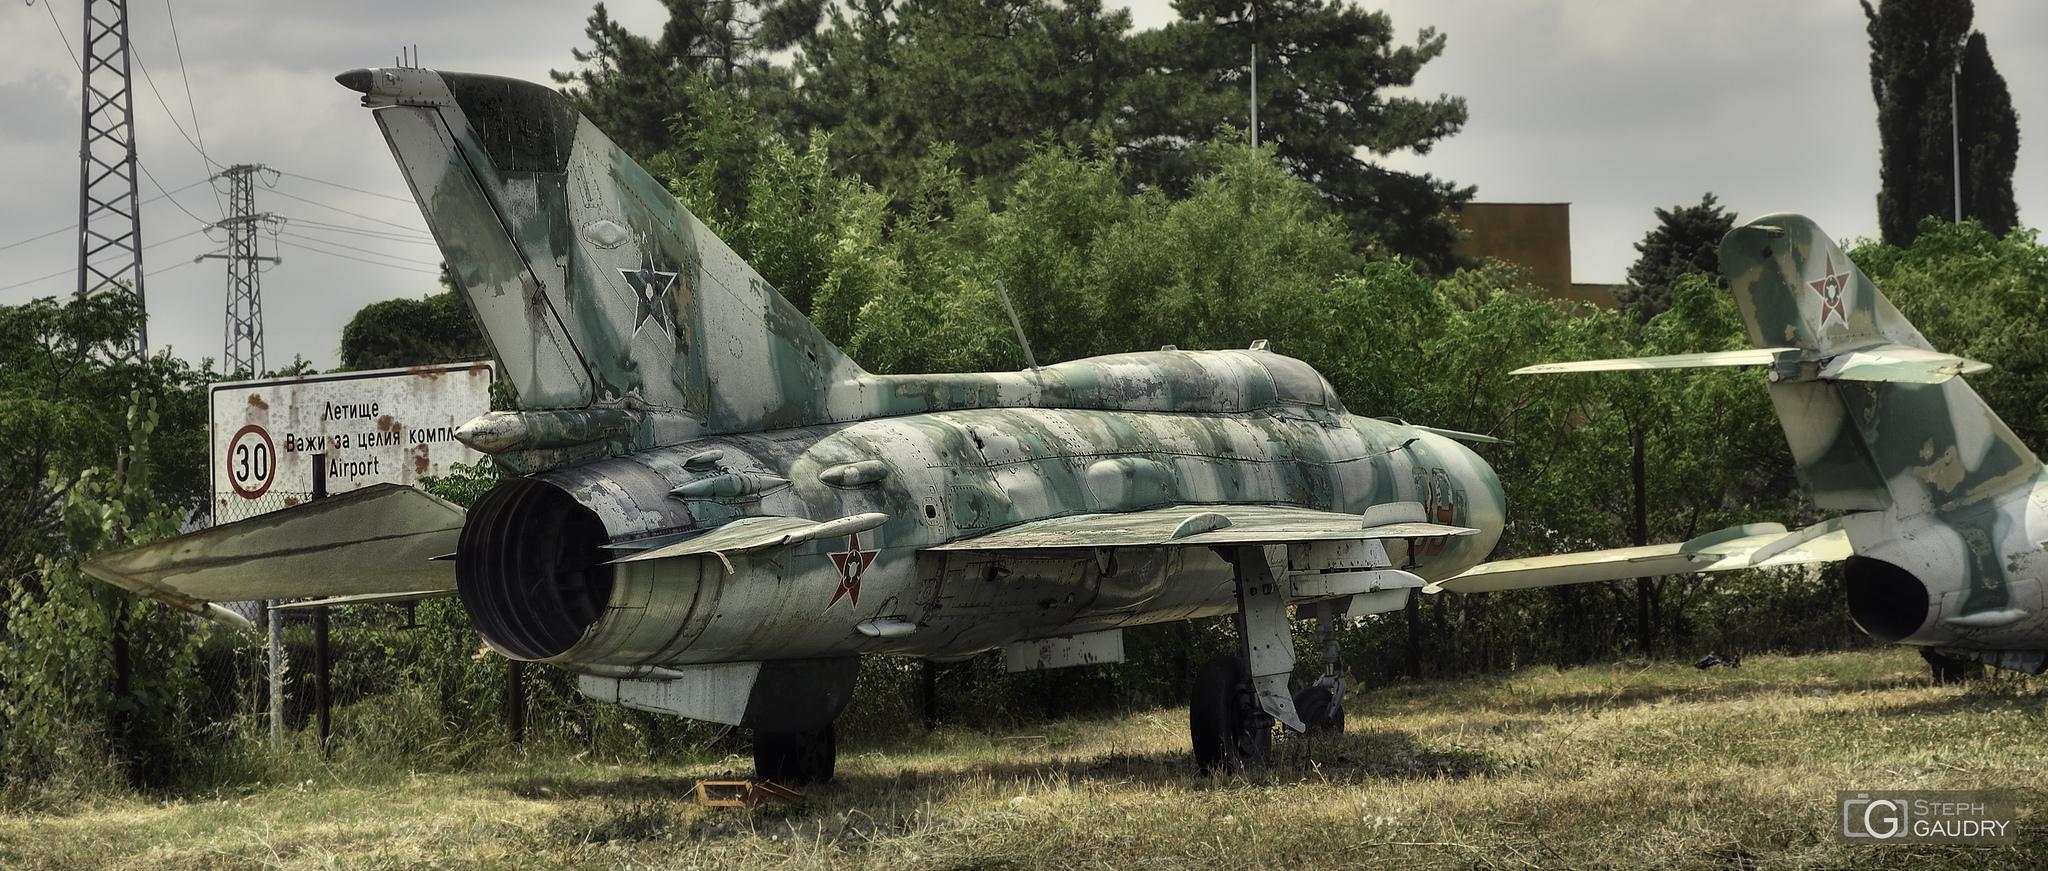 Old MiG-21 [Click to start slideshow]